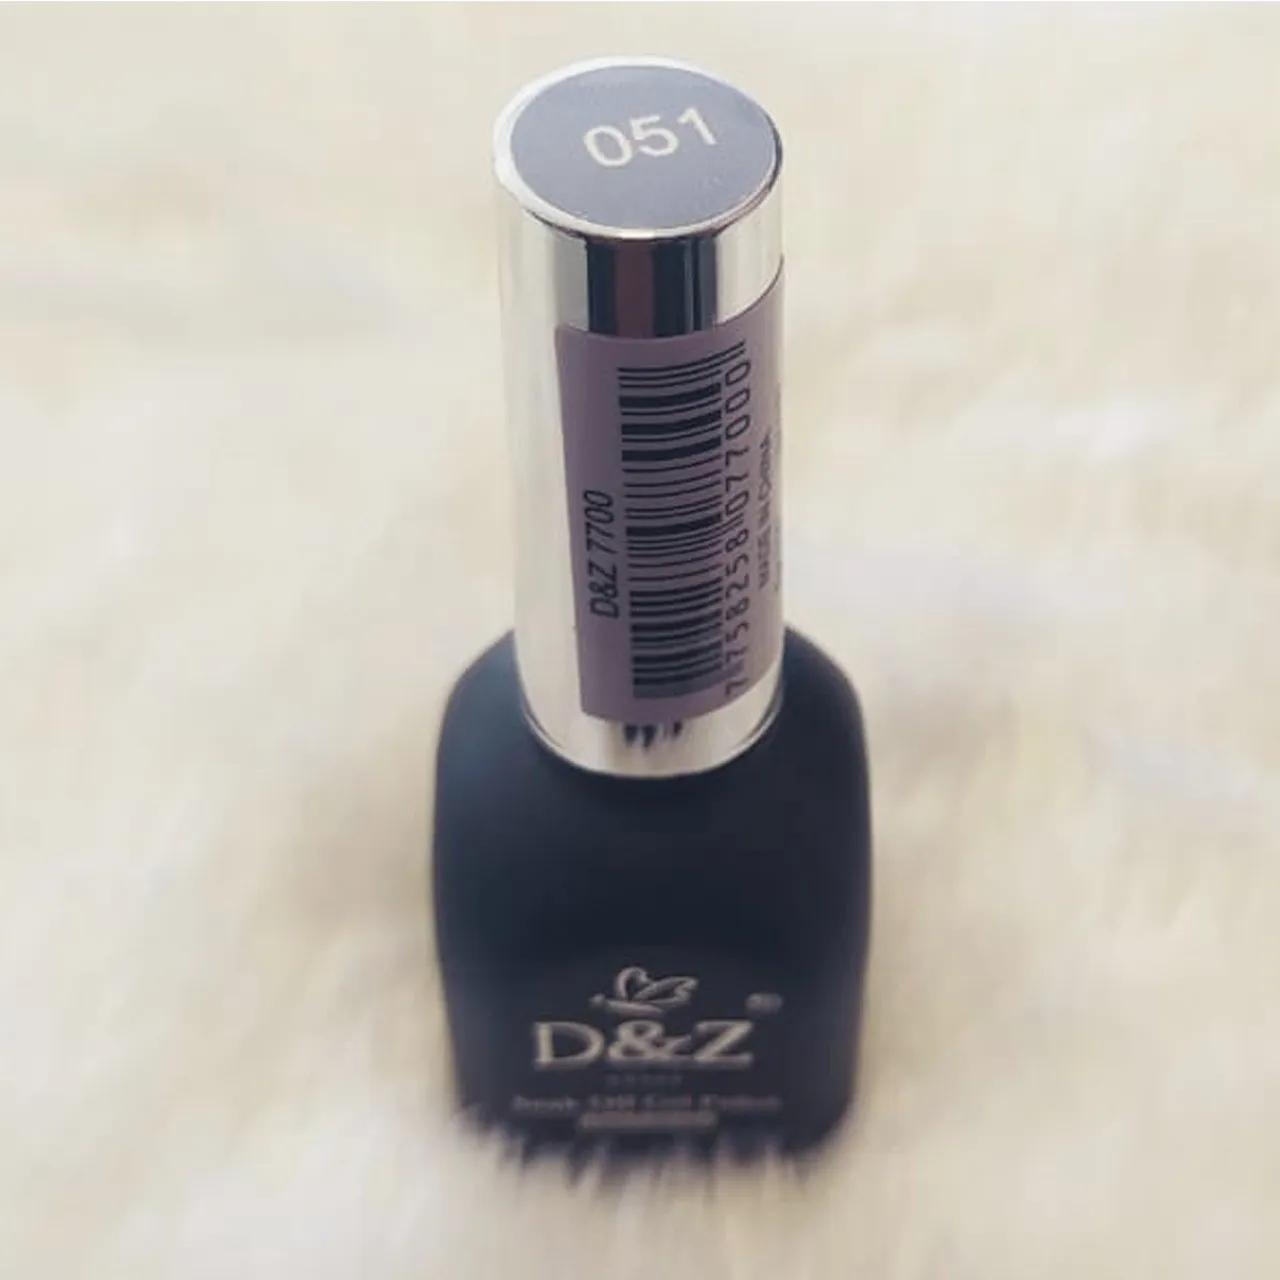 Esmalte em Gel D&Z 12ml - Soak Off Gel Polish - Cor 051